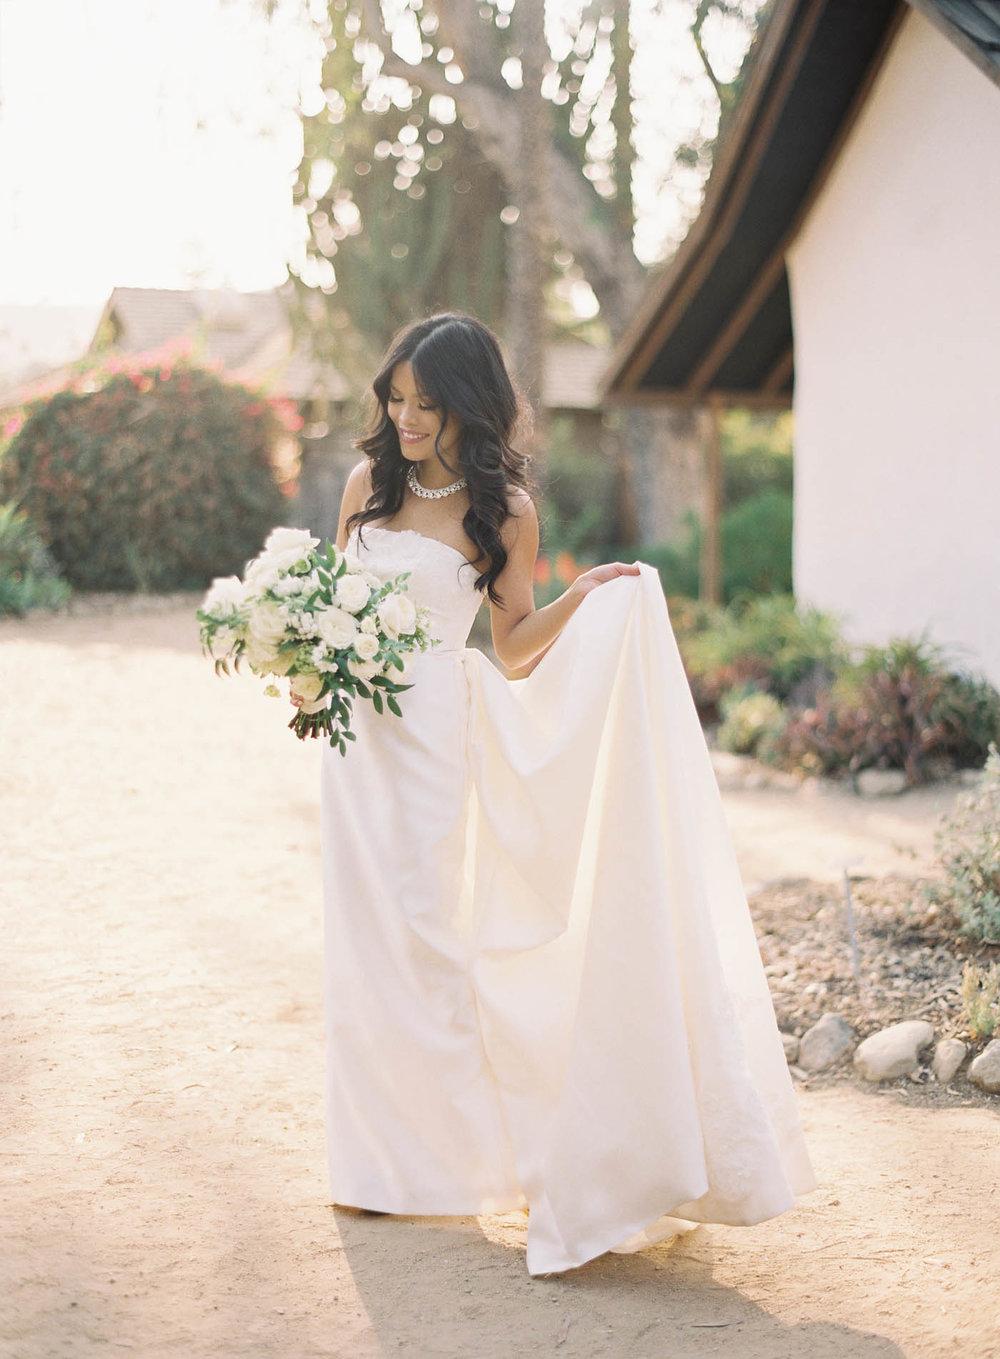 franciscan-gardens-wedding-11-Jen_Huang-000762-R1-003.jpg